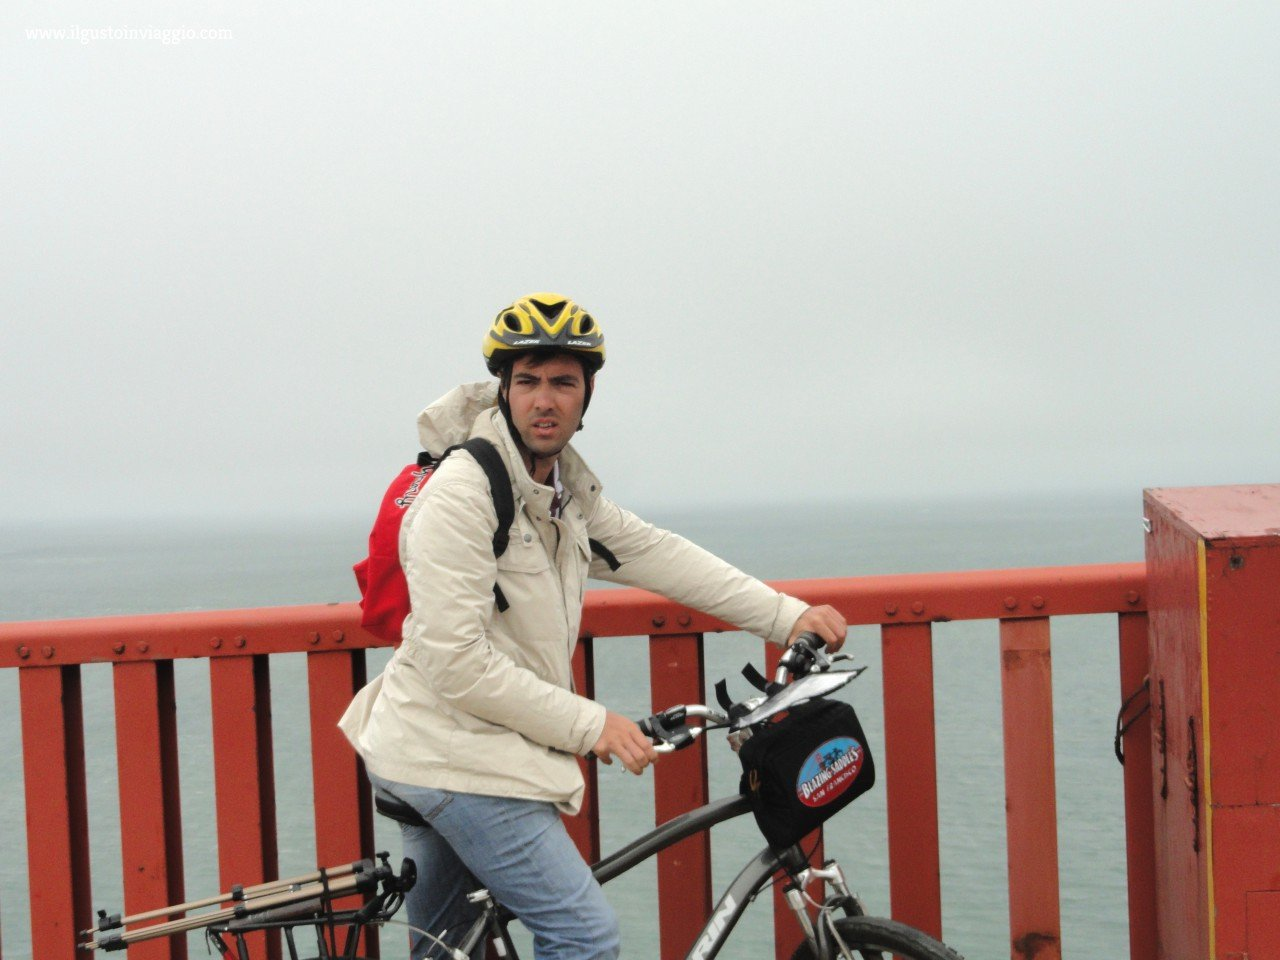 golden gate bridge in bici, rent bike san francisco